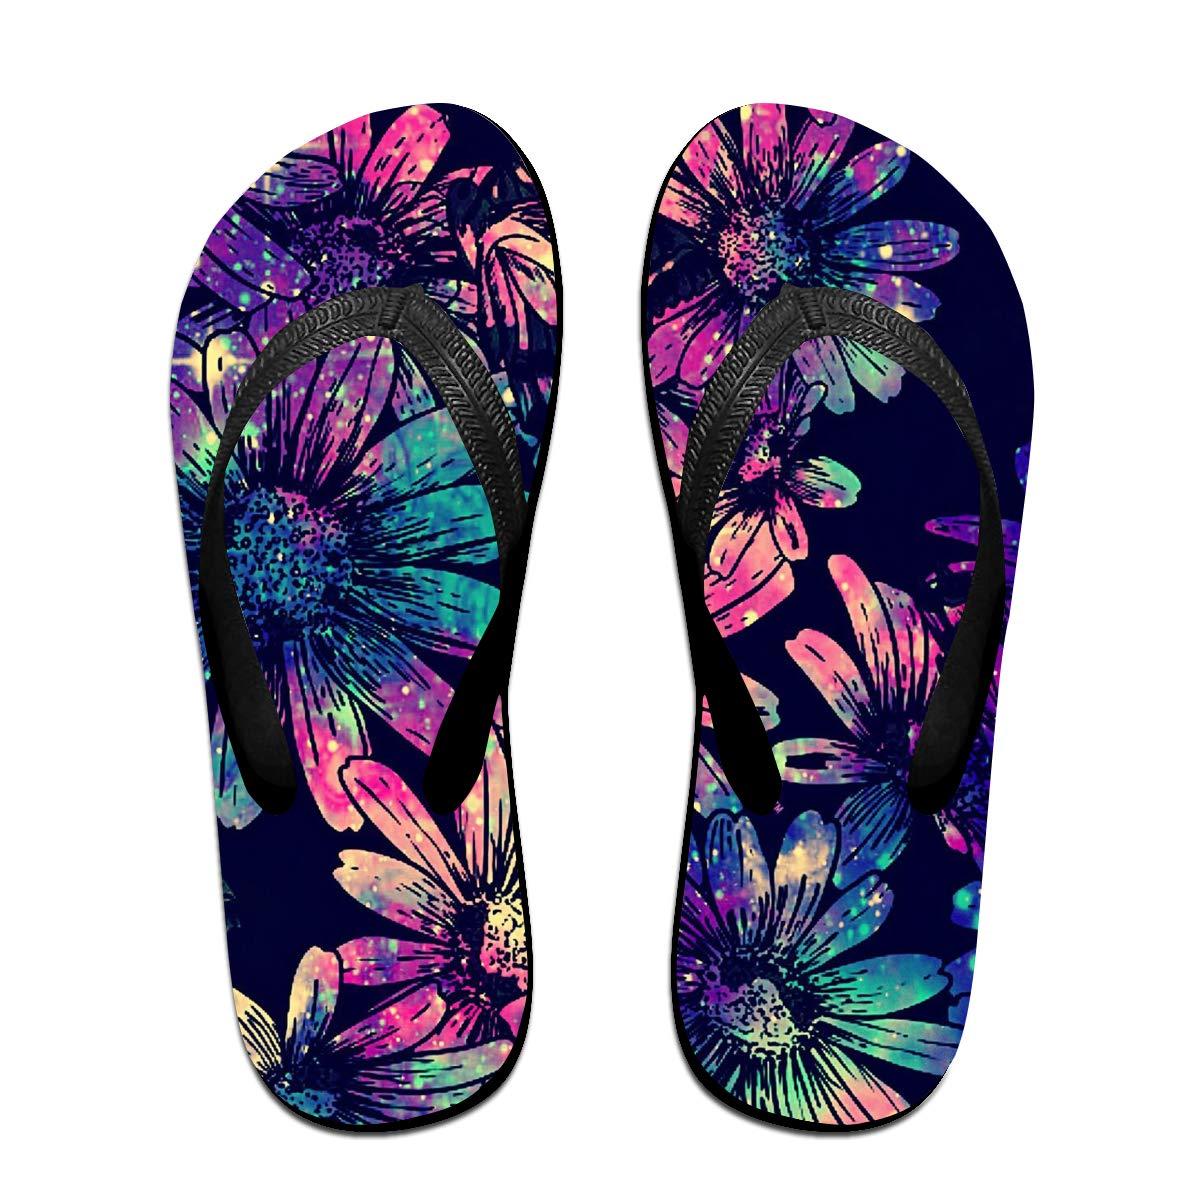 Lojaon Couple Slipper Blue Daisy Flowers Print Flip Flops Unisex Chic Sandals Rubber Non-Slip Spa Thong Slippers